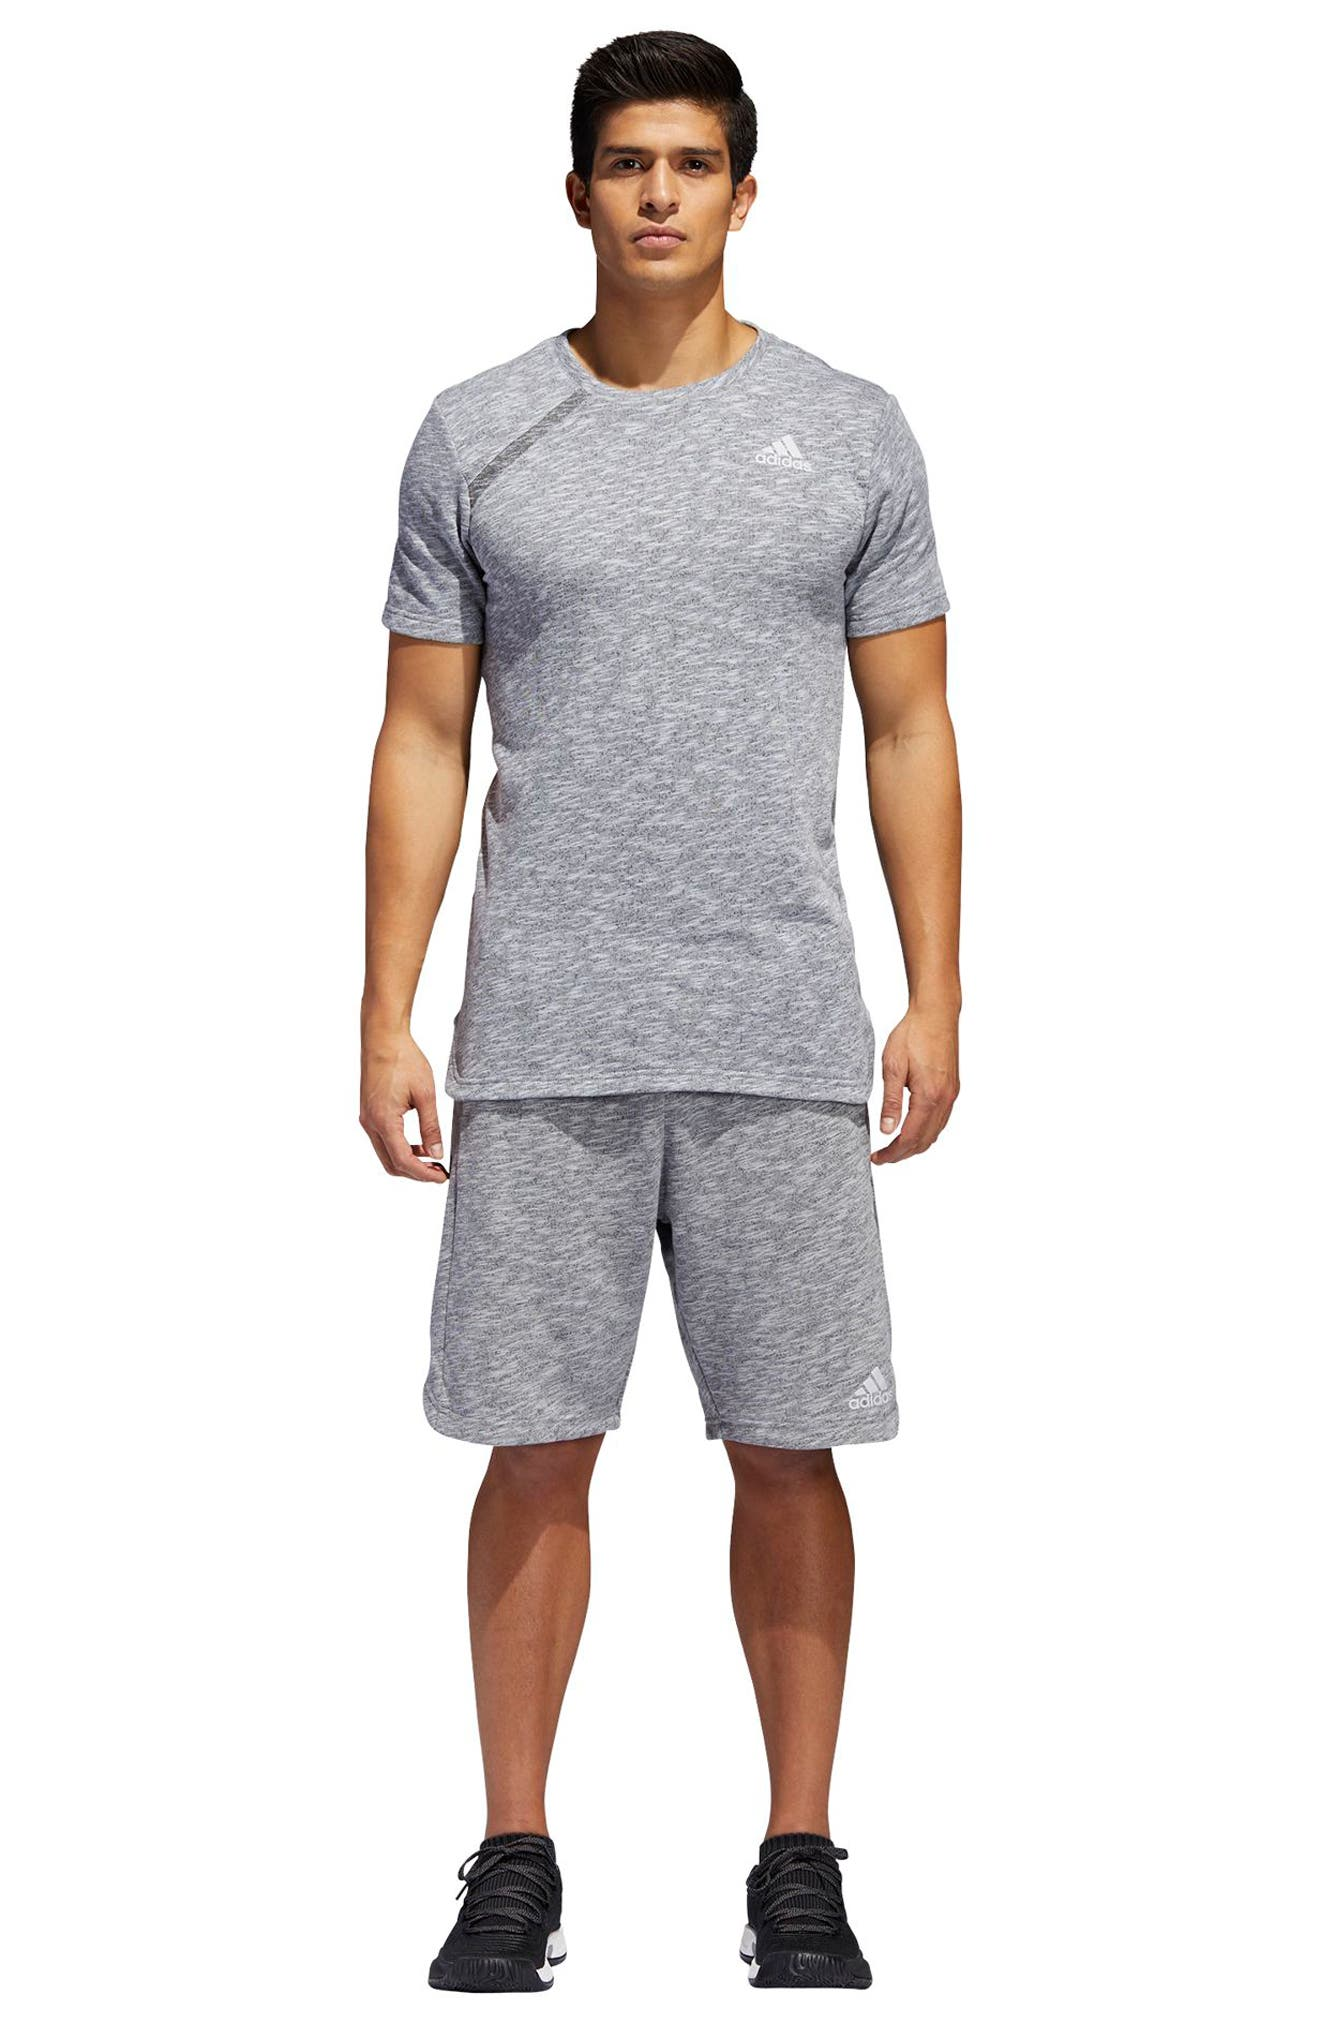 Pick Up Knit Shorts,                             Alternate thumbnail 7, color,                             Lgh Solid Grey